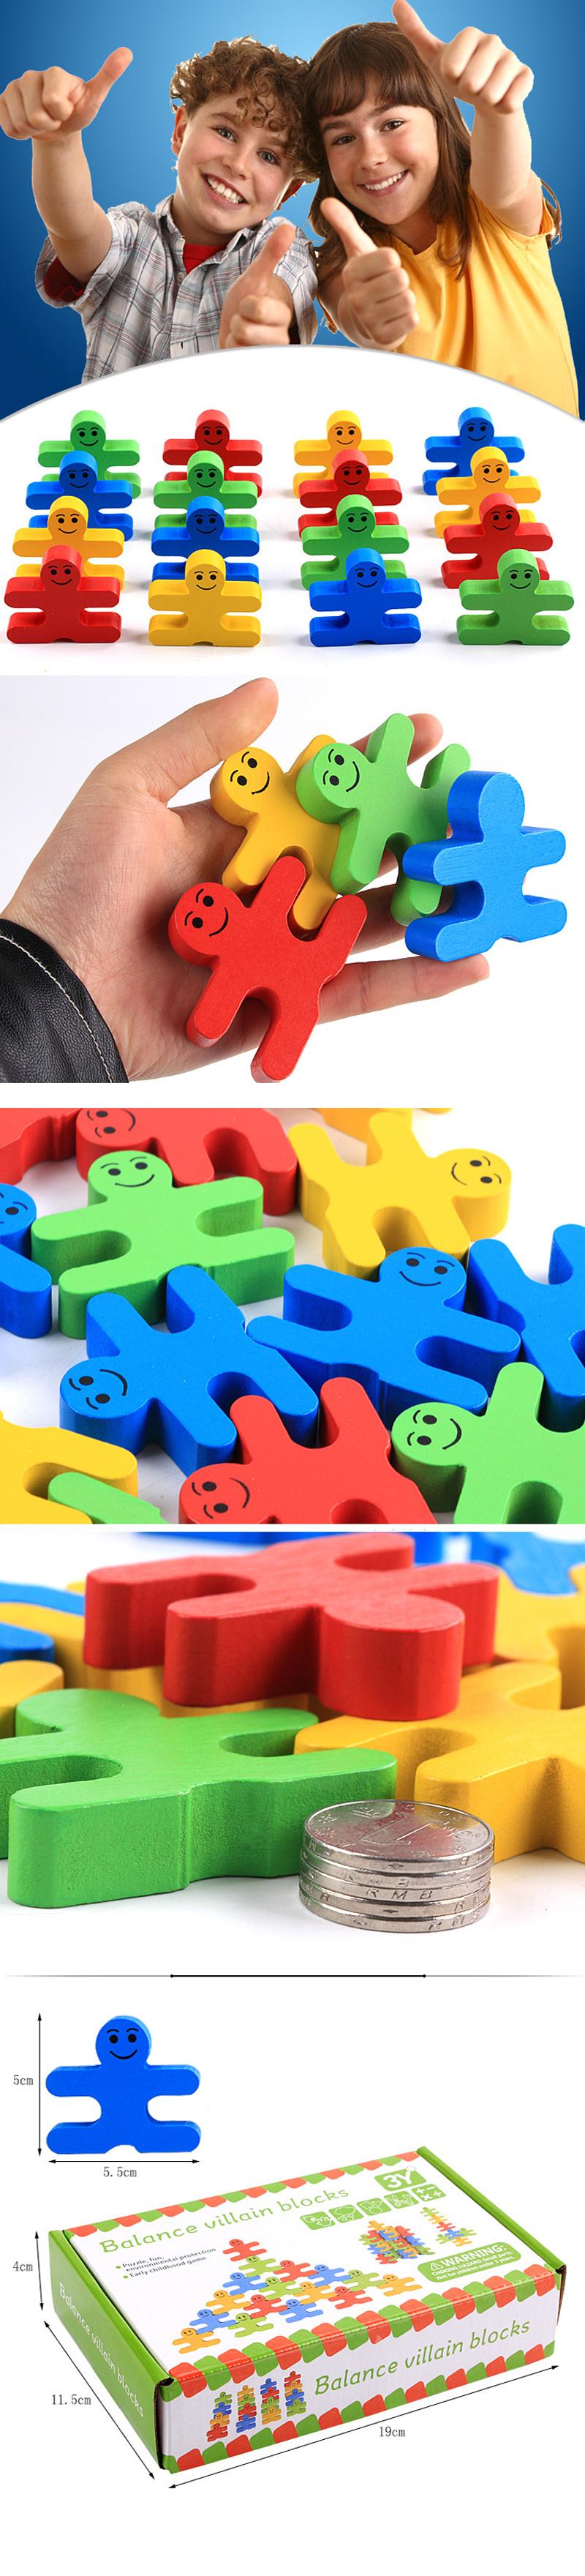 Wooden Creative Cartoon Balance Building Blocks Children's Educational Wooden Blocks Toys Kindergarten Teaching Aids  (#0)